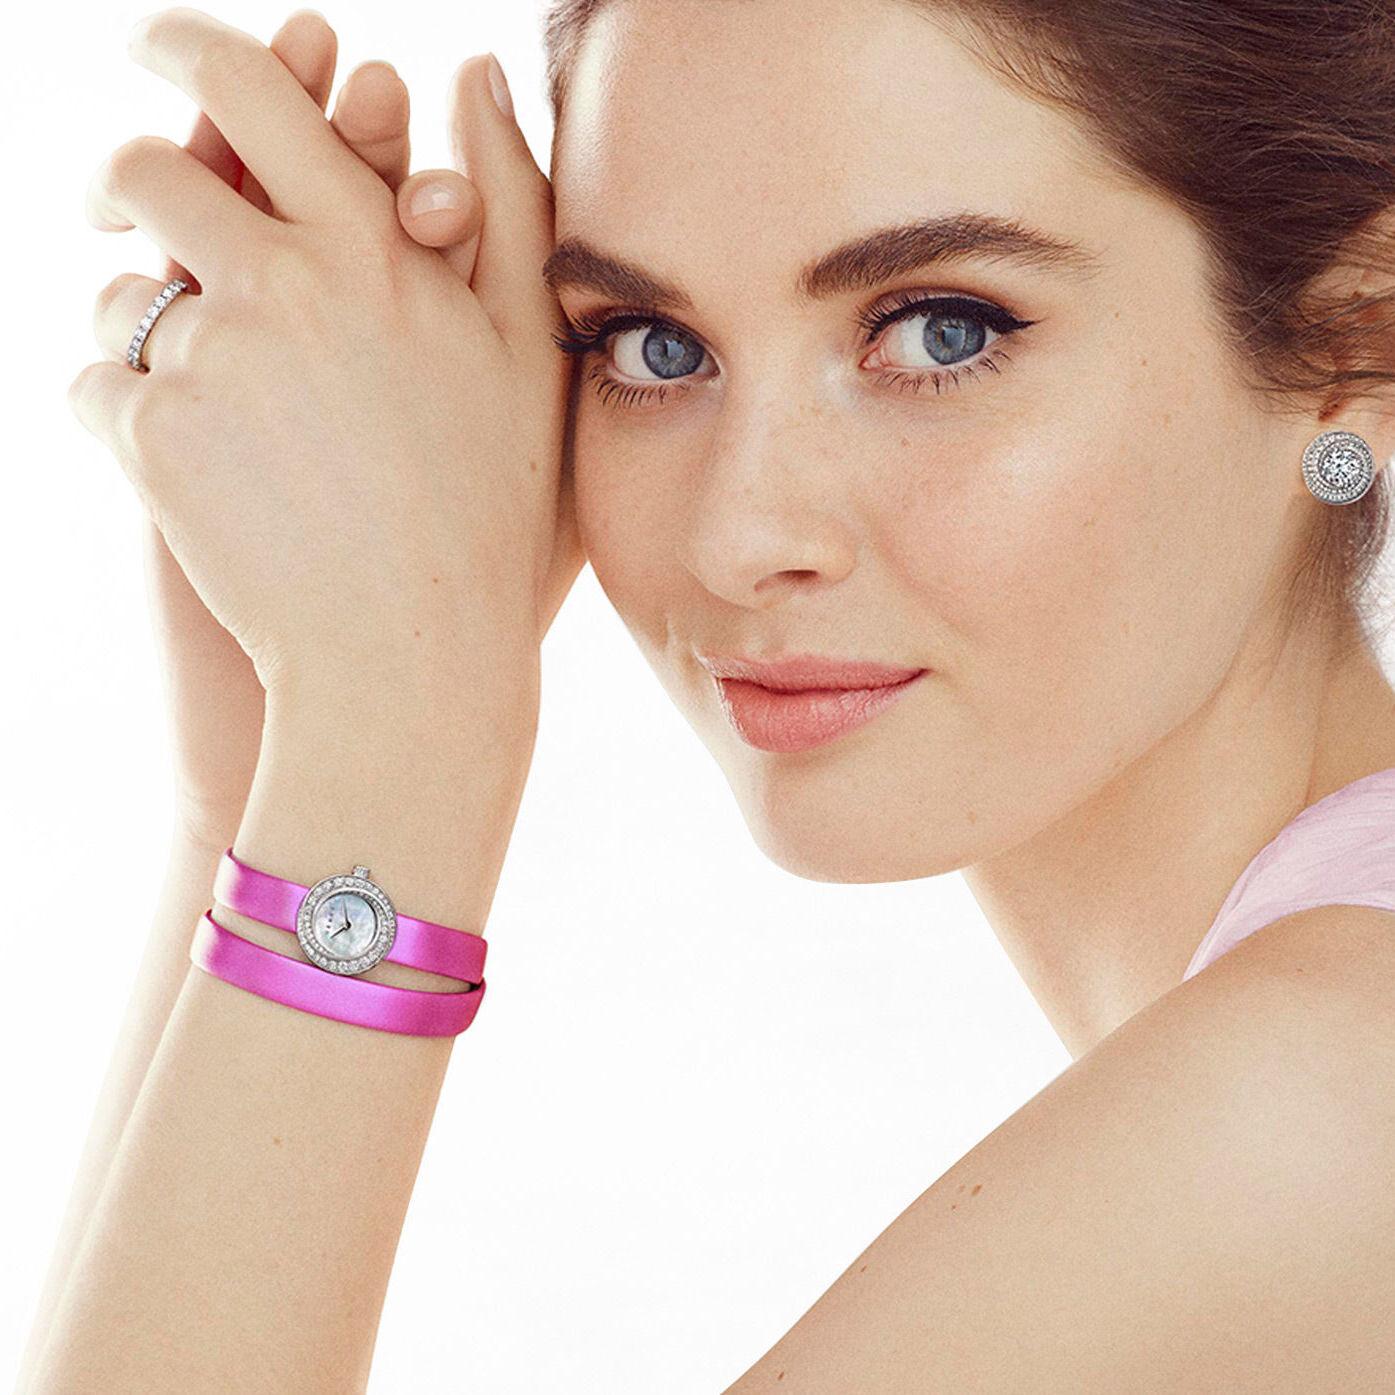 Model wears a Graff Spiral watch with a pink satin strap